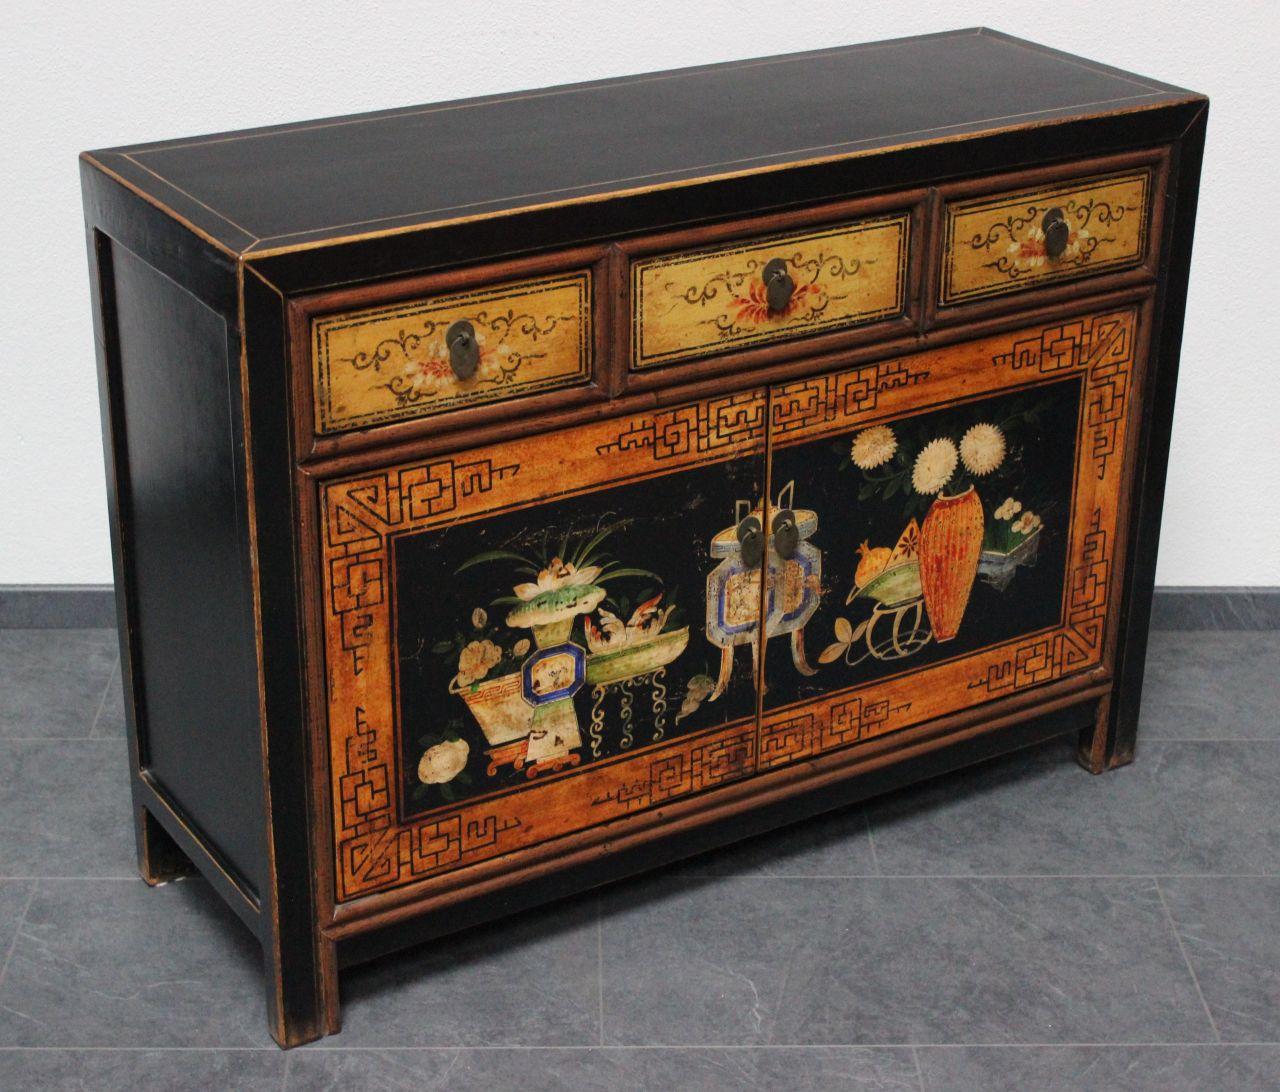 asiatische kommode schwarz 117 cm antik look sideboard china asienlifestyle ebay